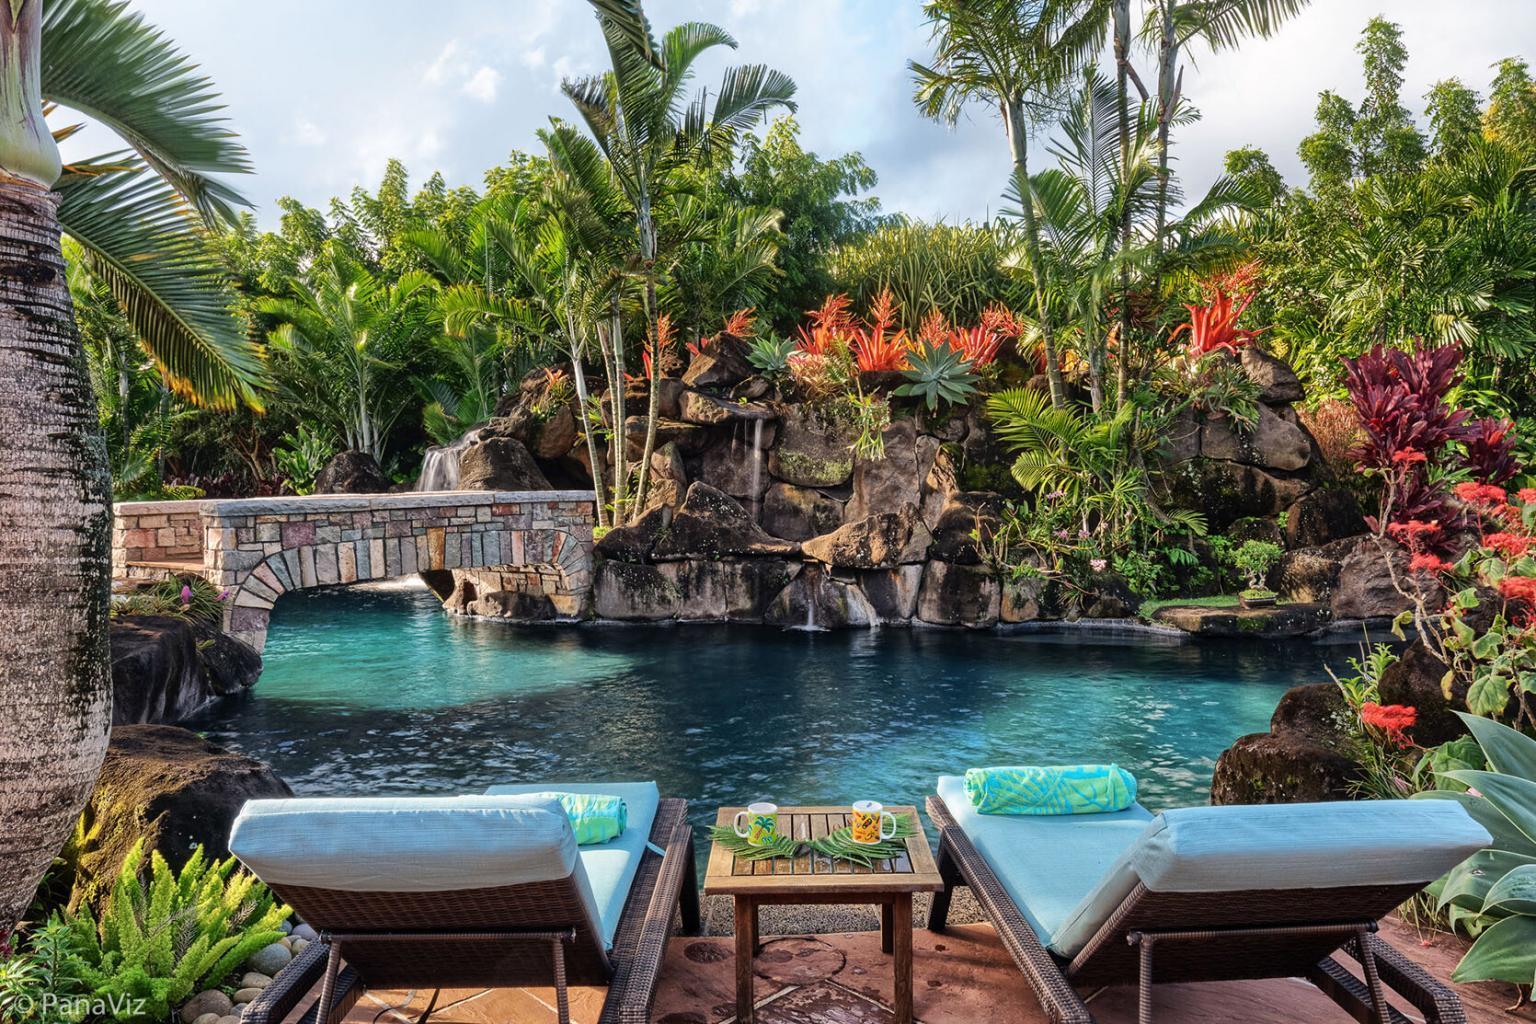 resort-pool-photography-panaviz